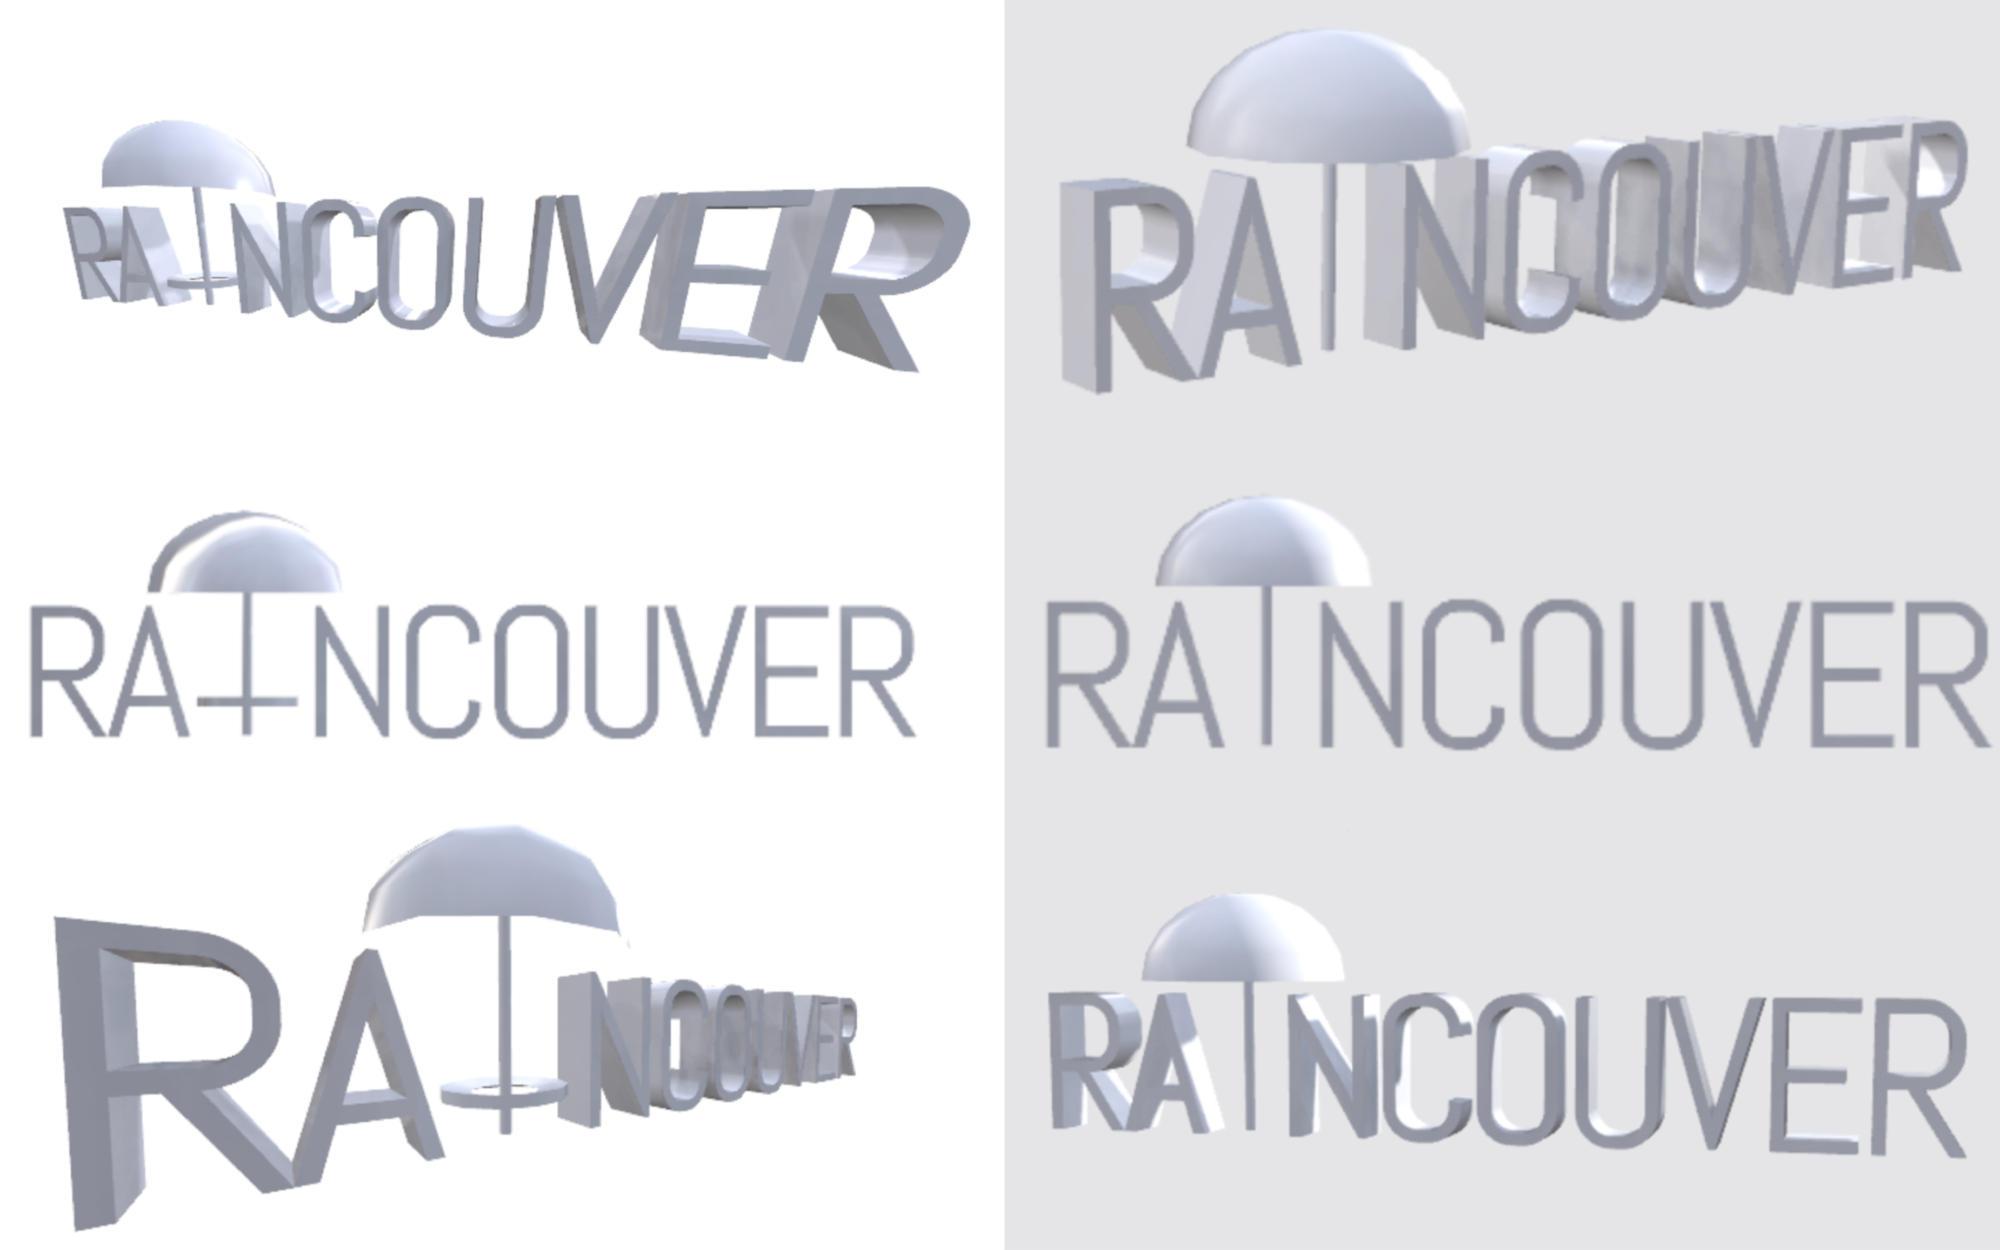 B11 – Raincouver